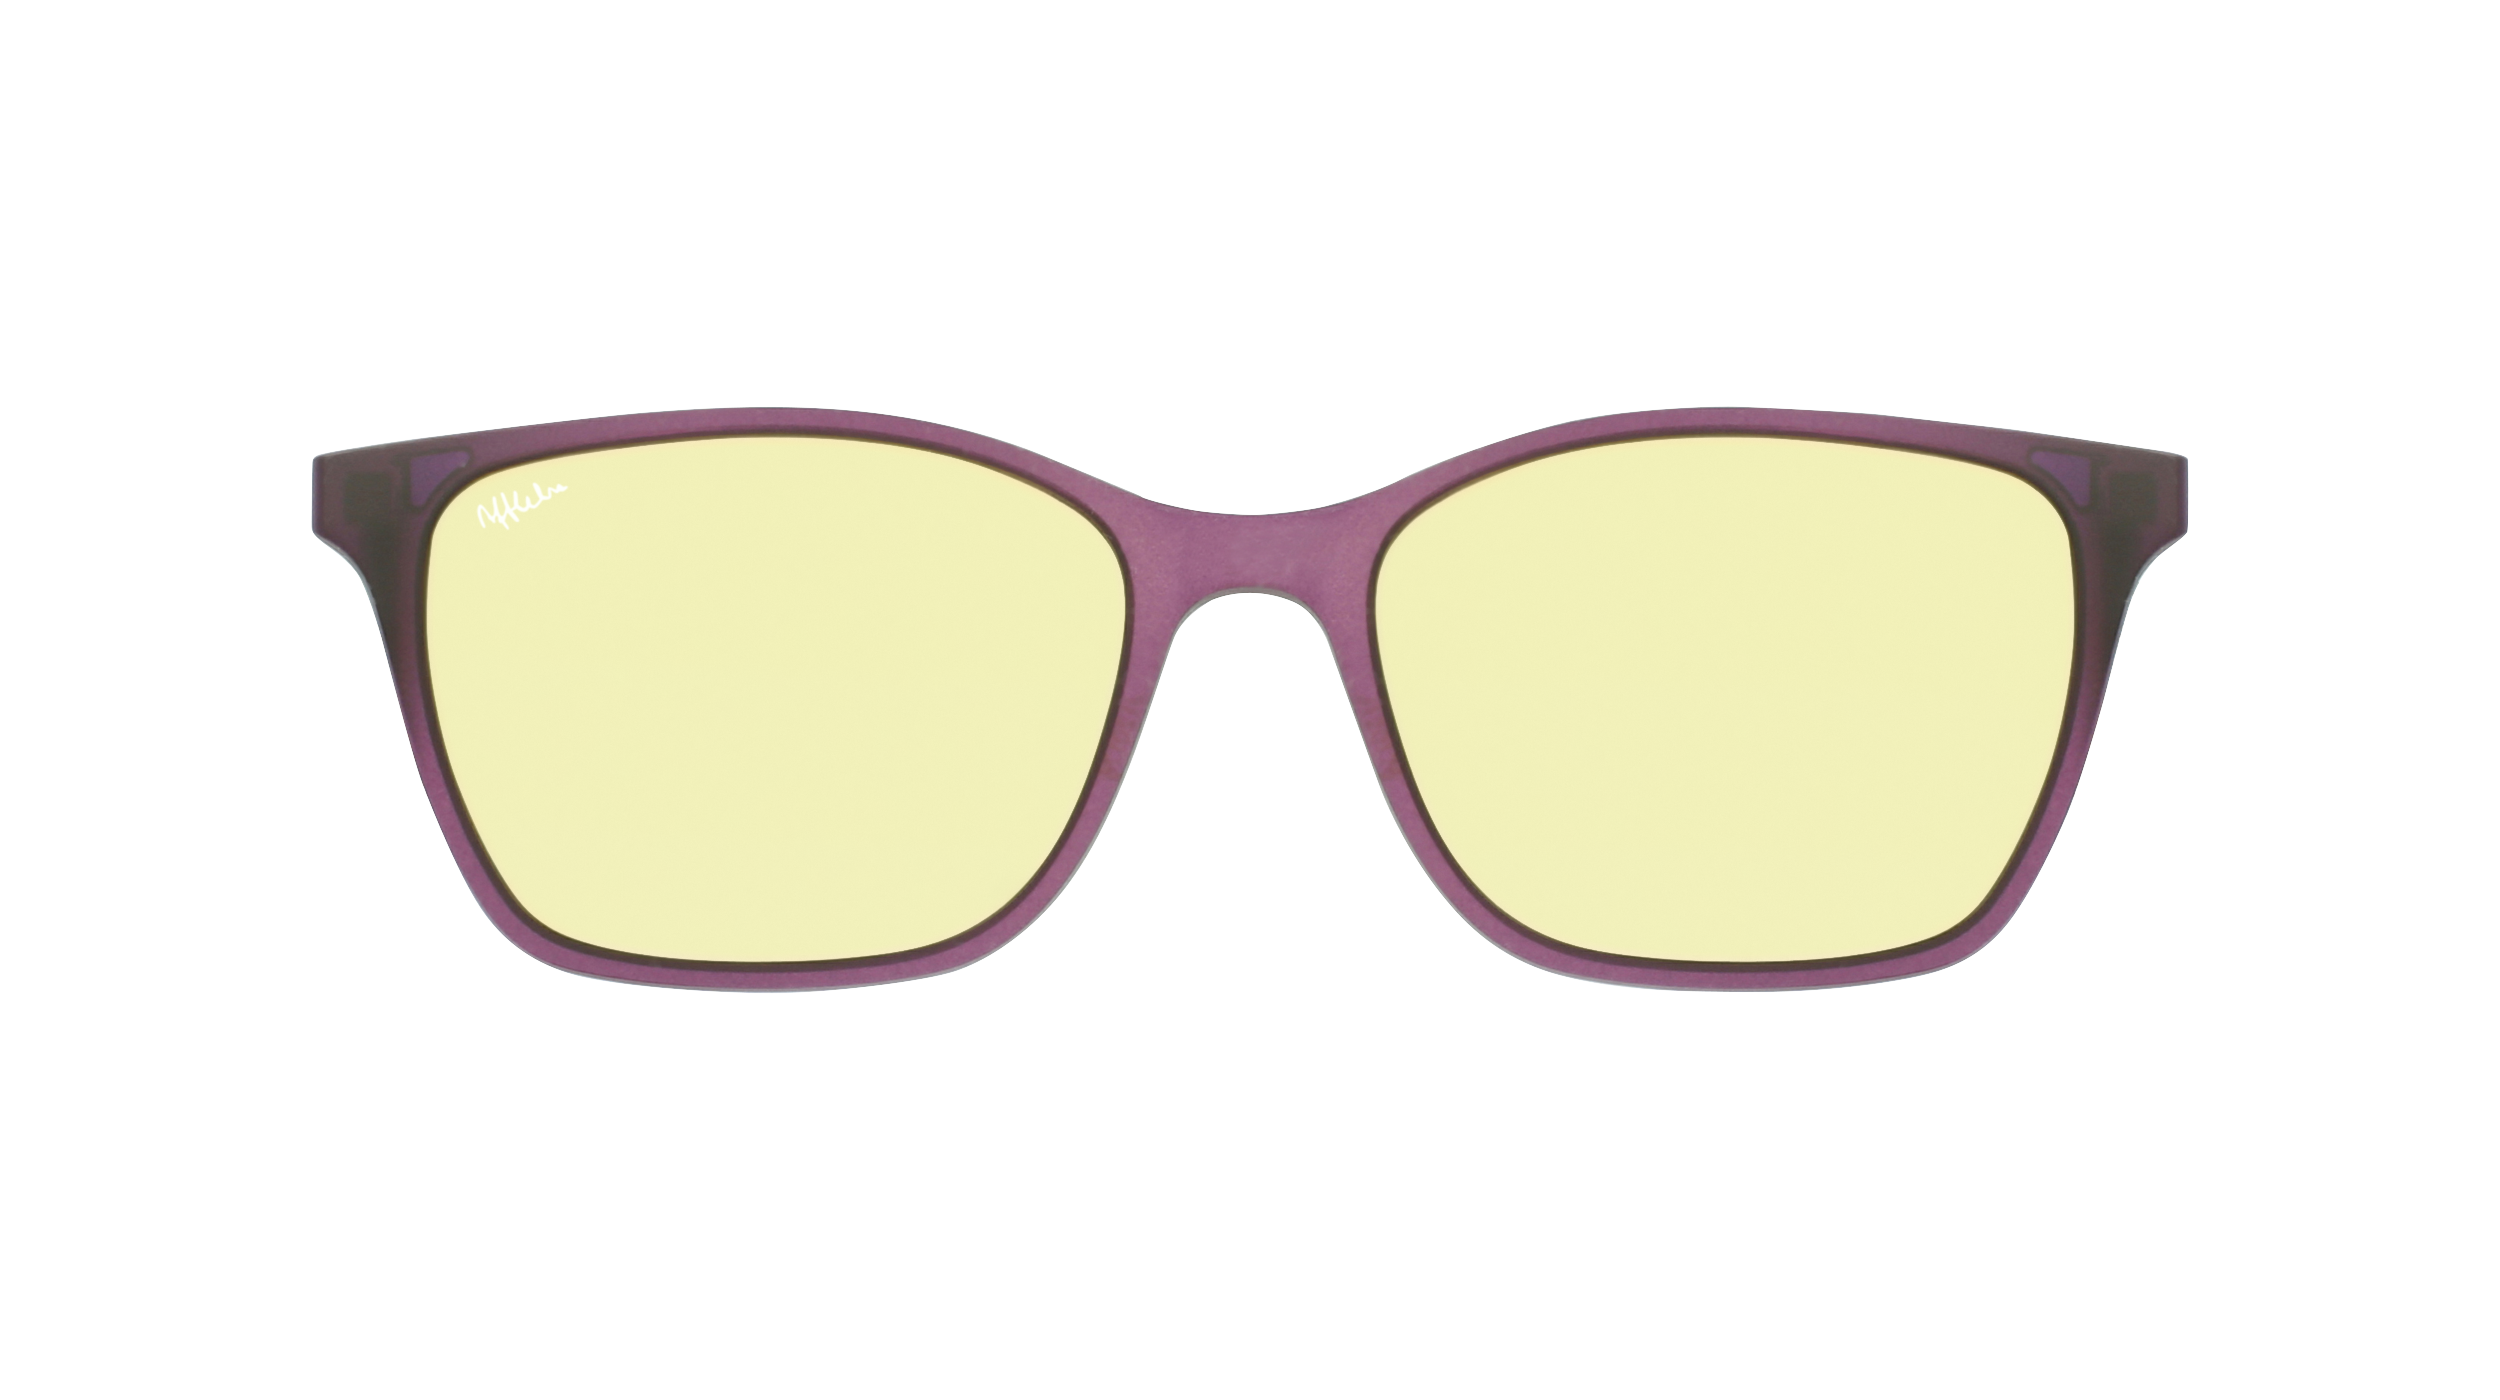 afflelou/france/products/smart_clip/clips_glasses/07630036457634.png